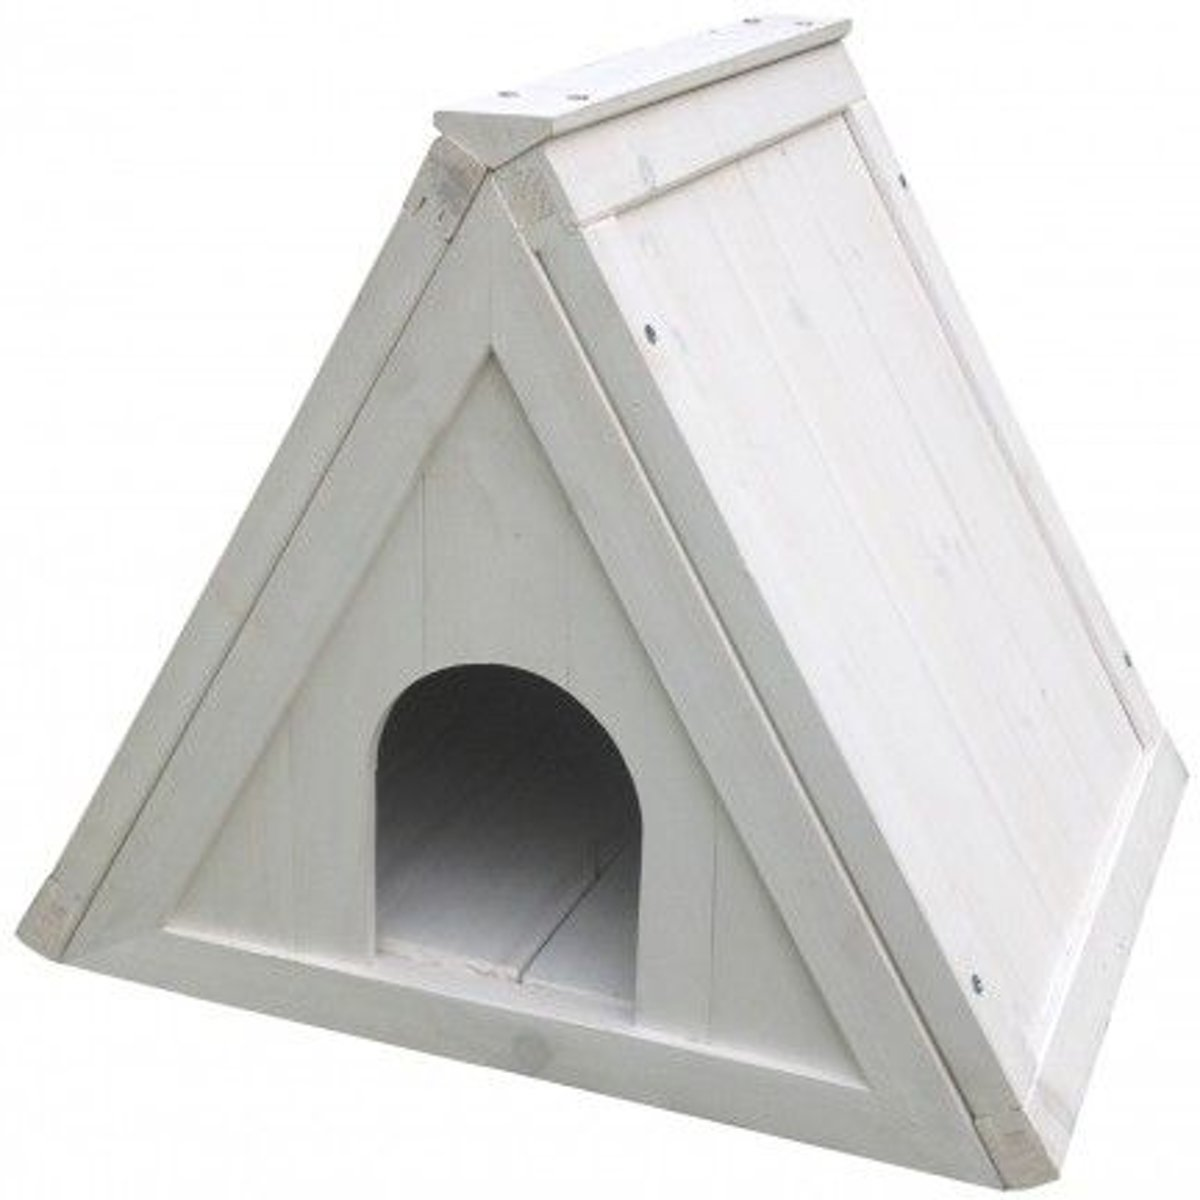 Duvo+ Schuilhok Pam Cottage  - Wit - 50 x 42 x 42cm kopen